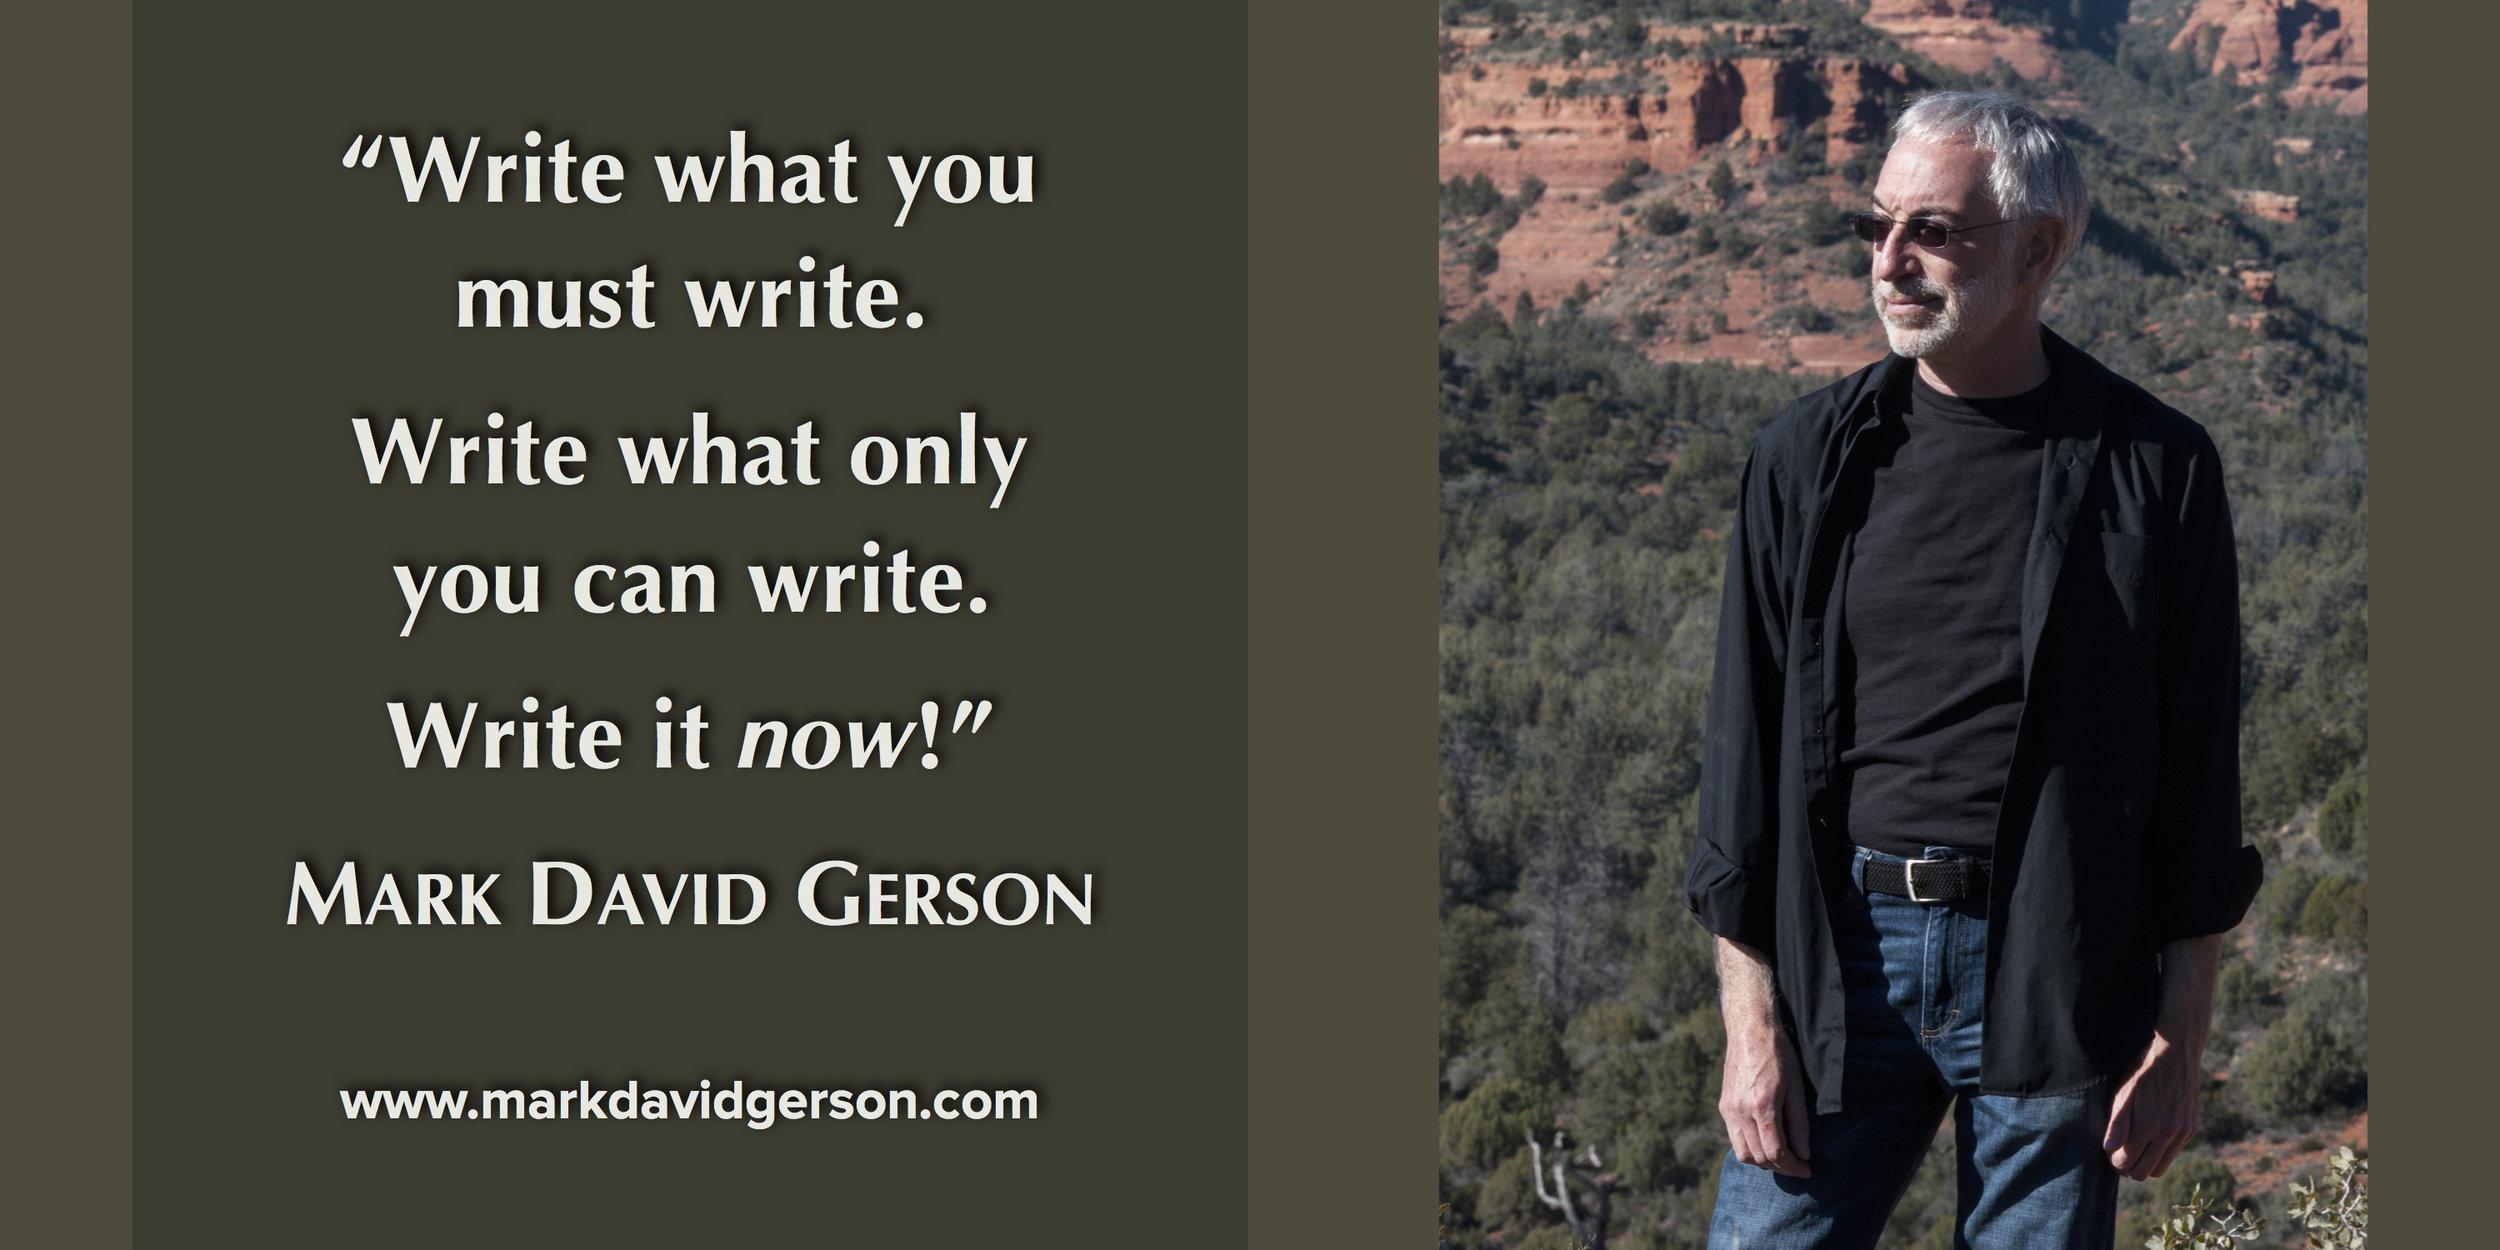 MDG | Write what you must write.jpg